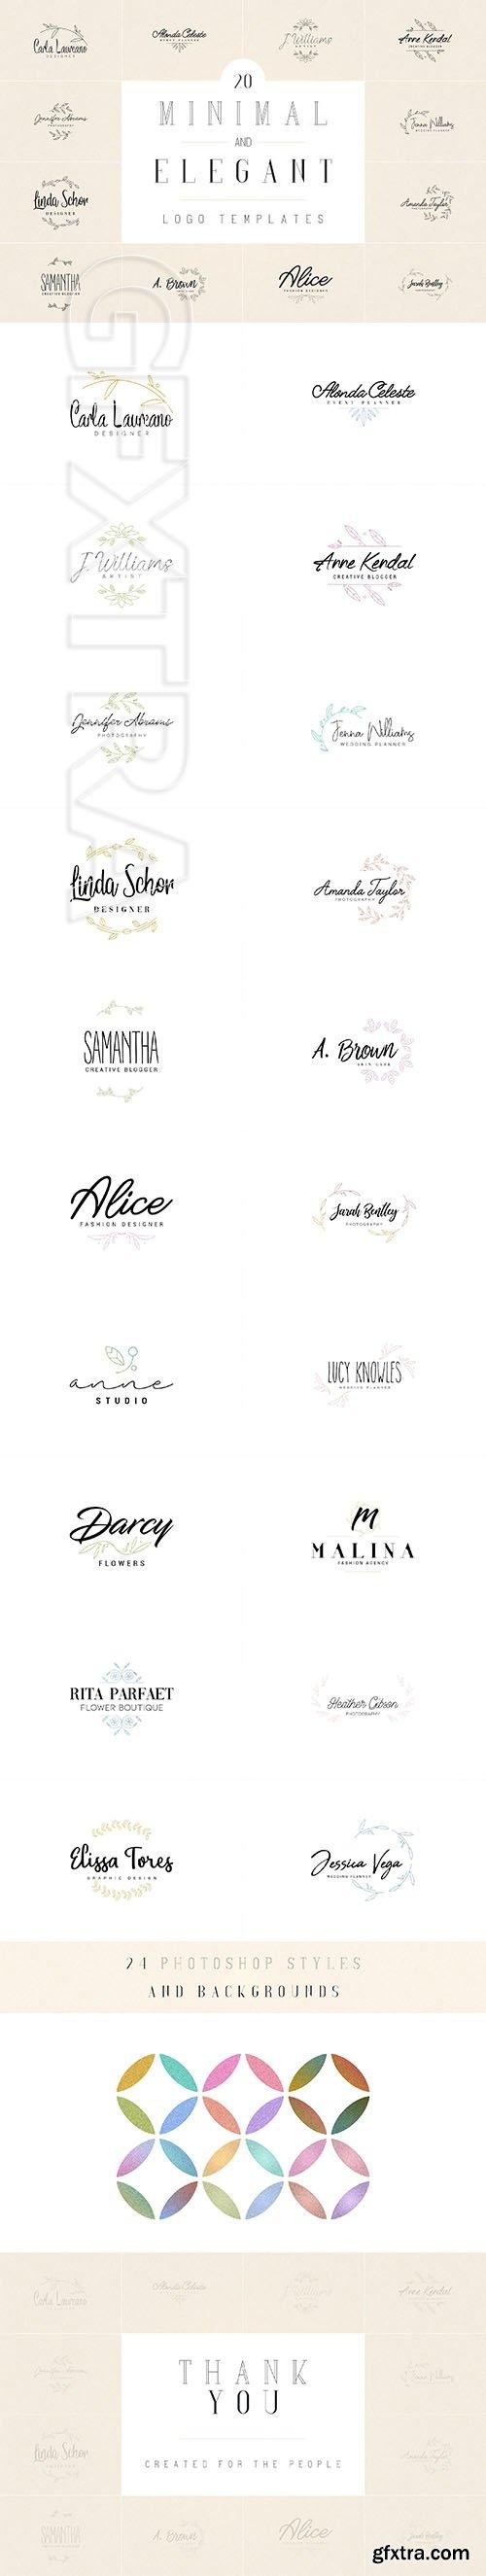 CreativeMarket - 20 Minimal and Elegant Logos 2780190